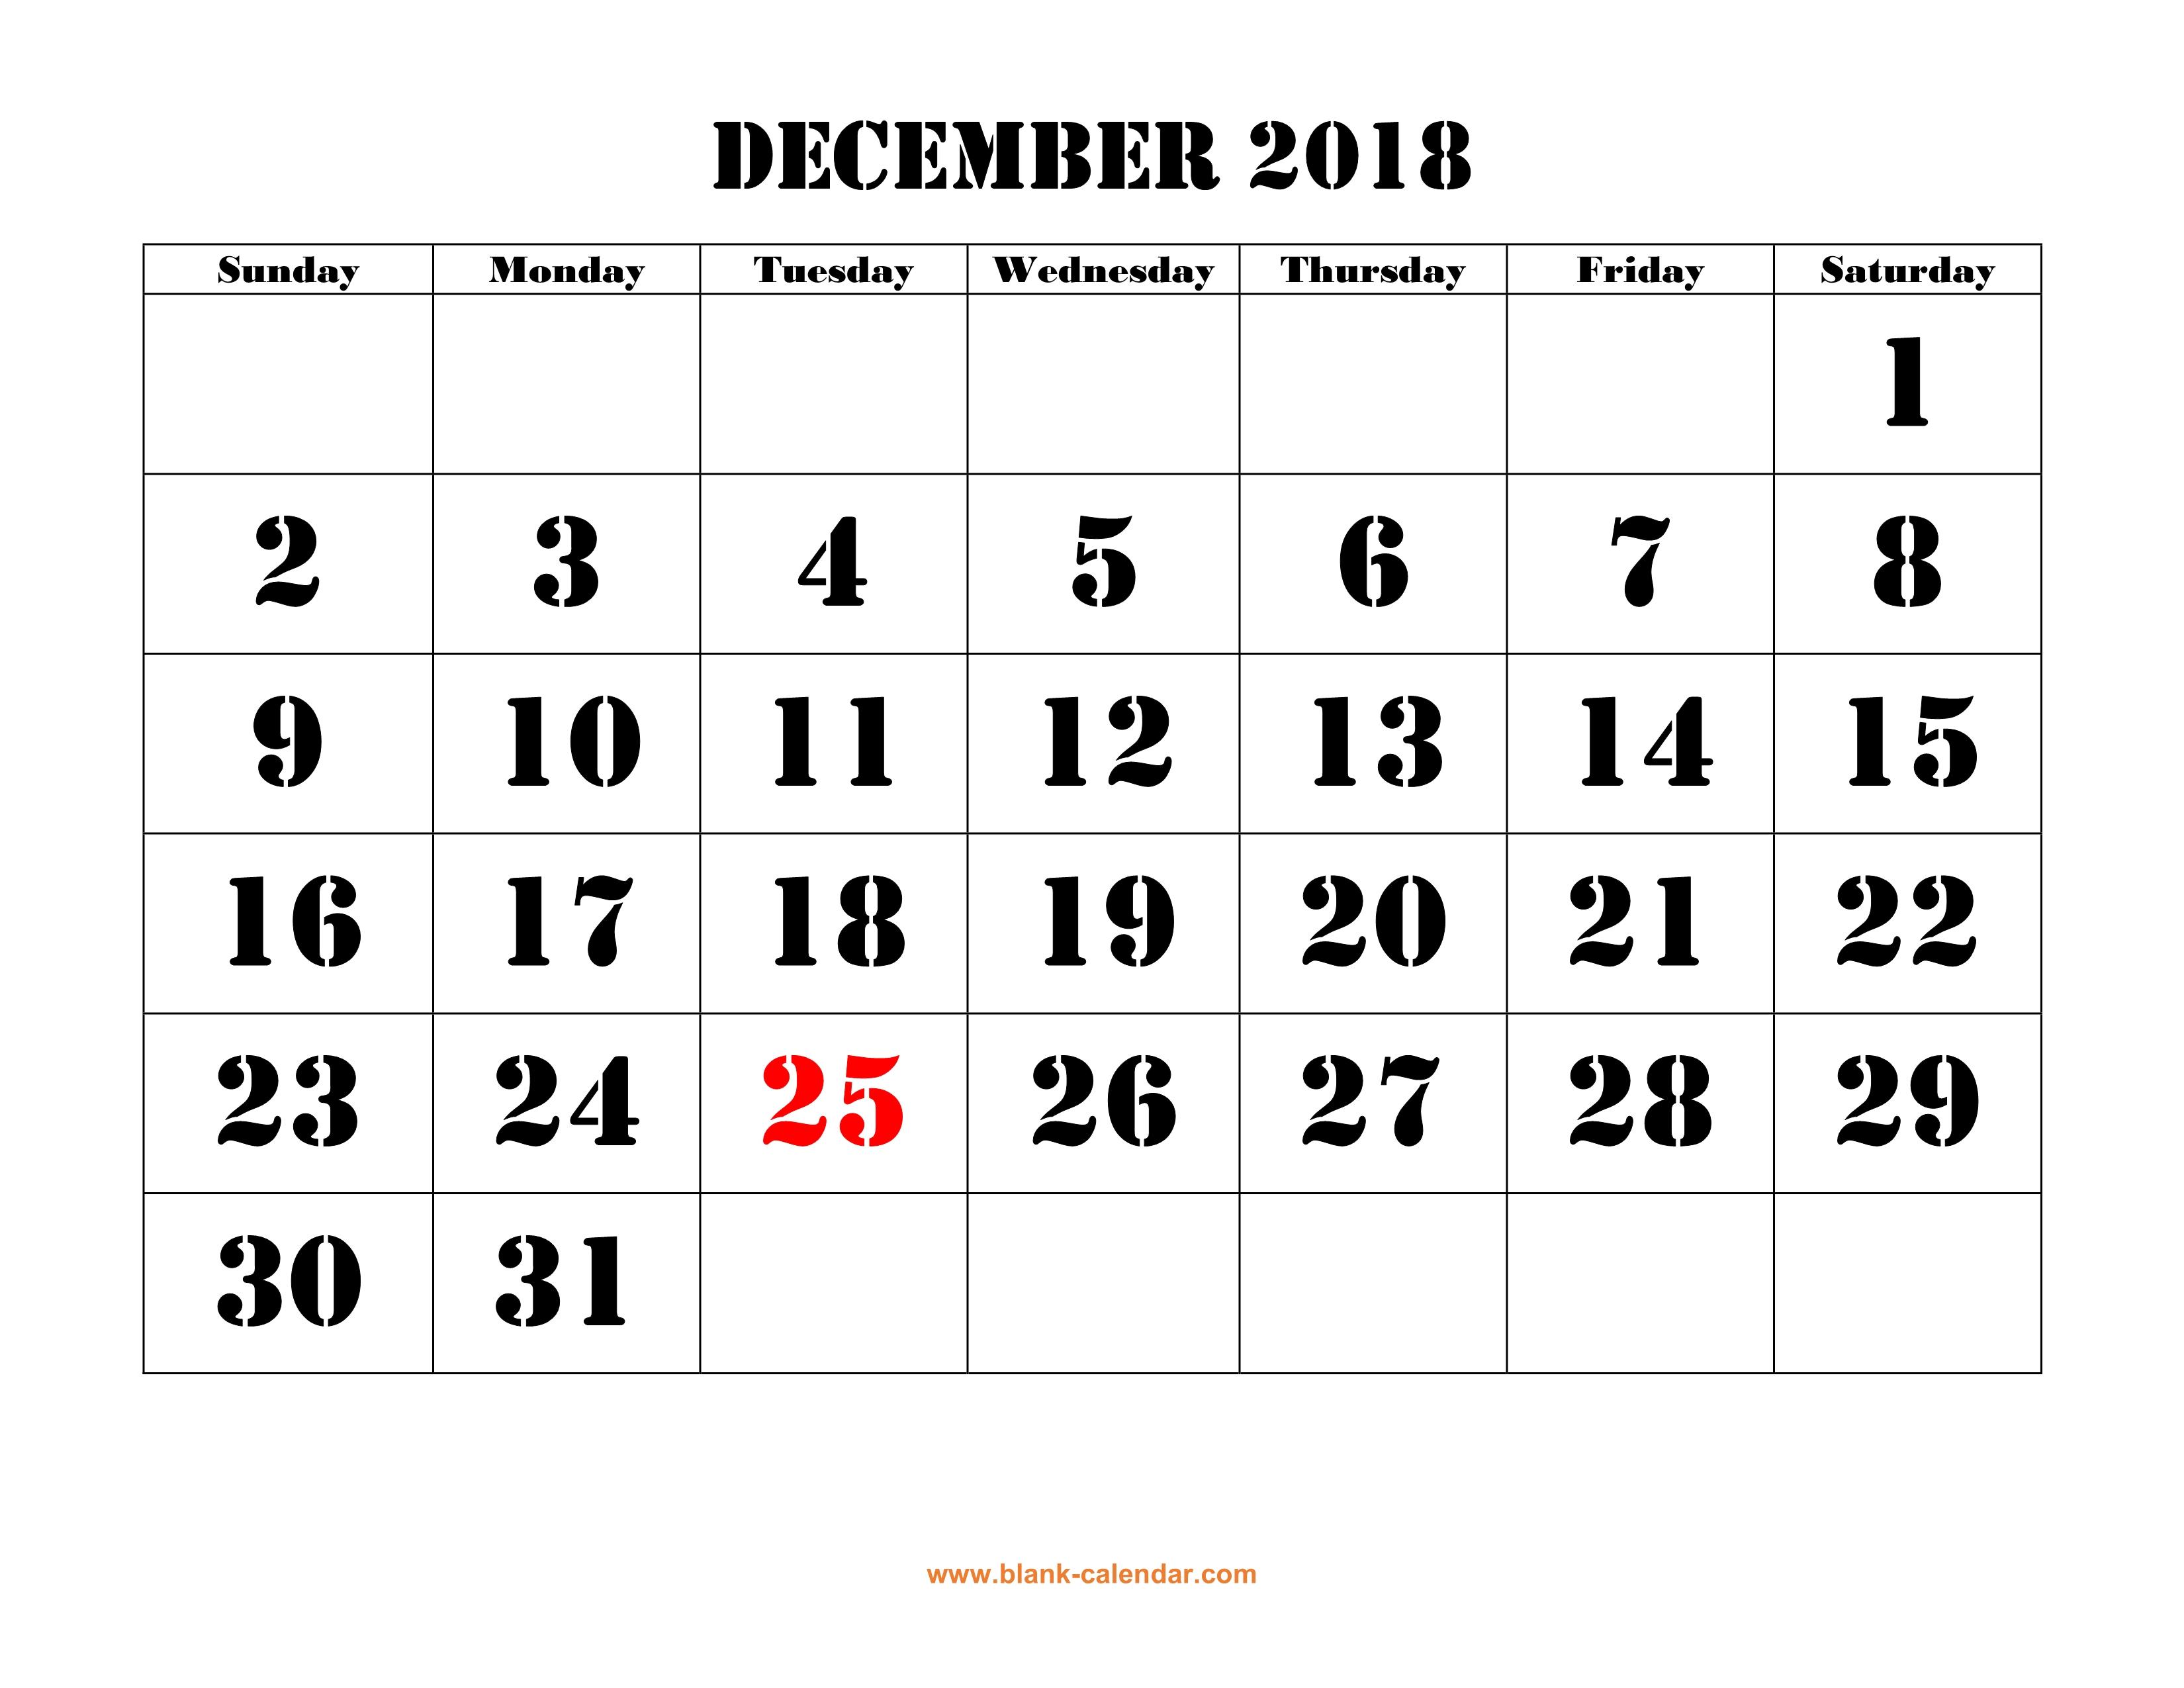 Free Download Printable December 2018 Calendar, Large Font Design pertaining to Blank Calendar Template December